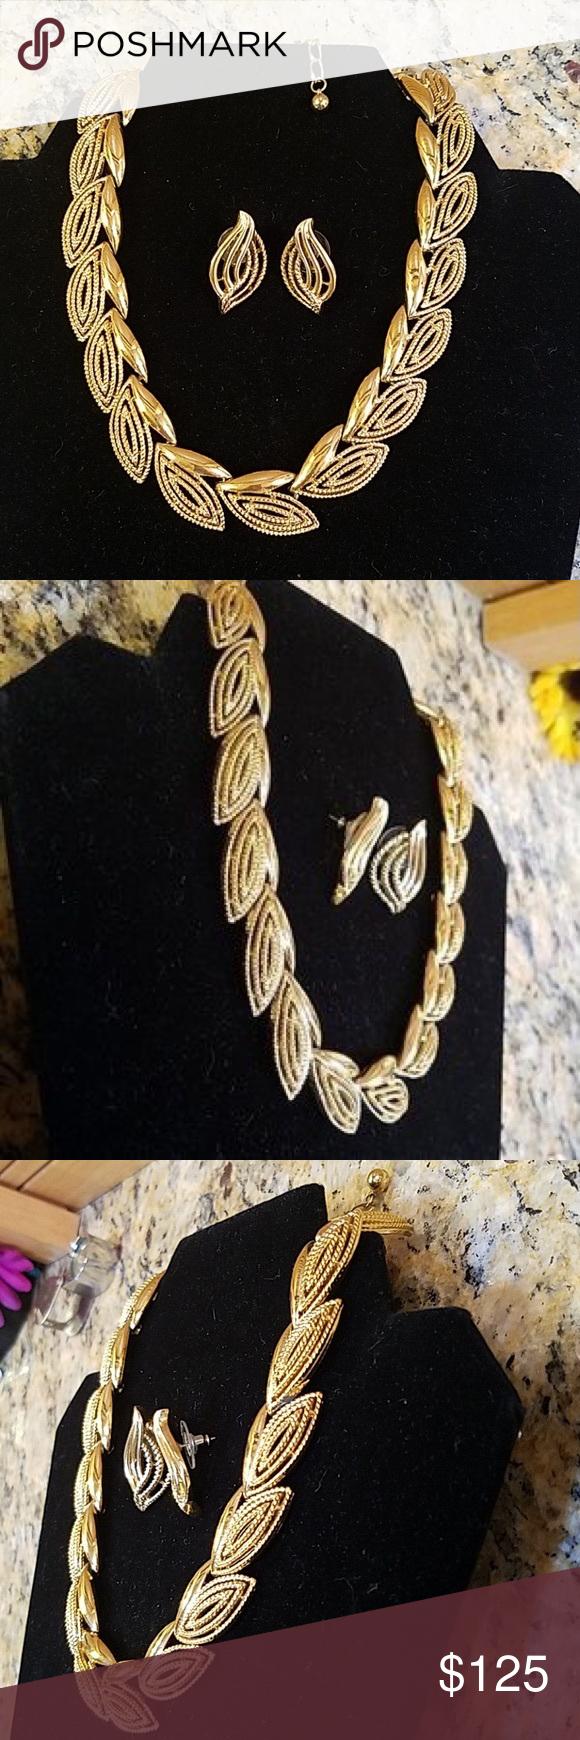 Photo of Vintage goldene Trifari Halskette & Ohrringe GUC Vintage Trifari goldene Halskette & …